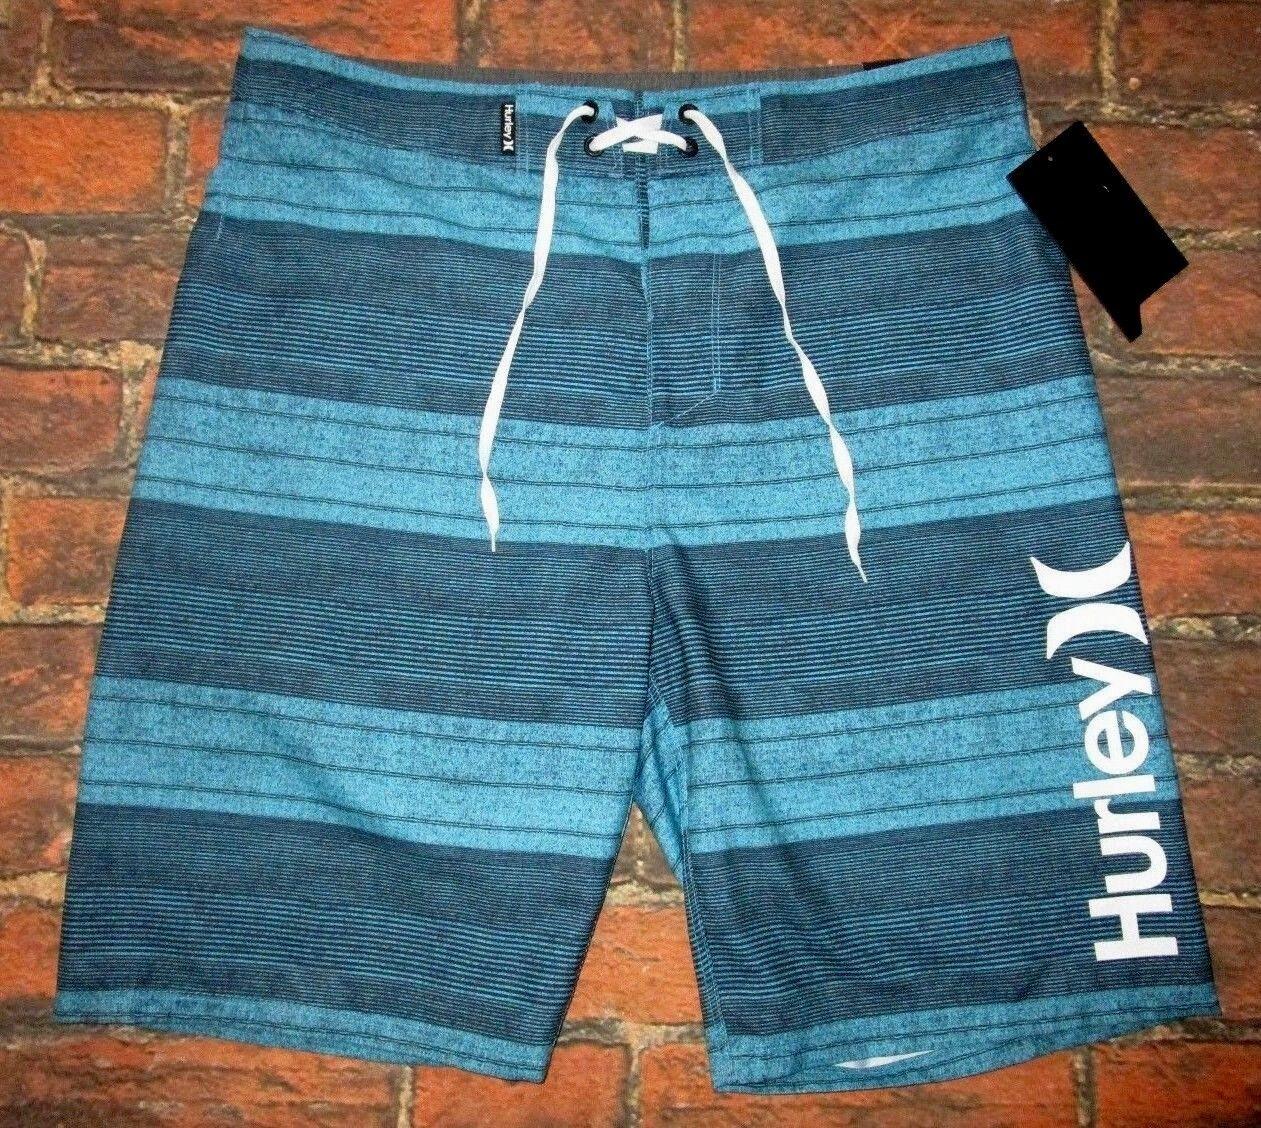 MENS HURLEY blueE SWIM BOARD SHORTS SIZE 34